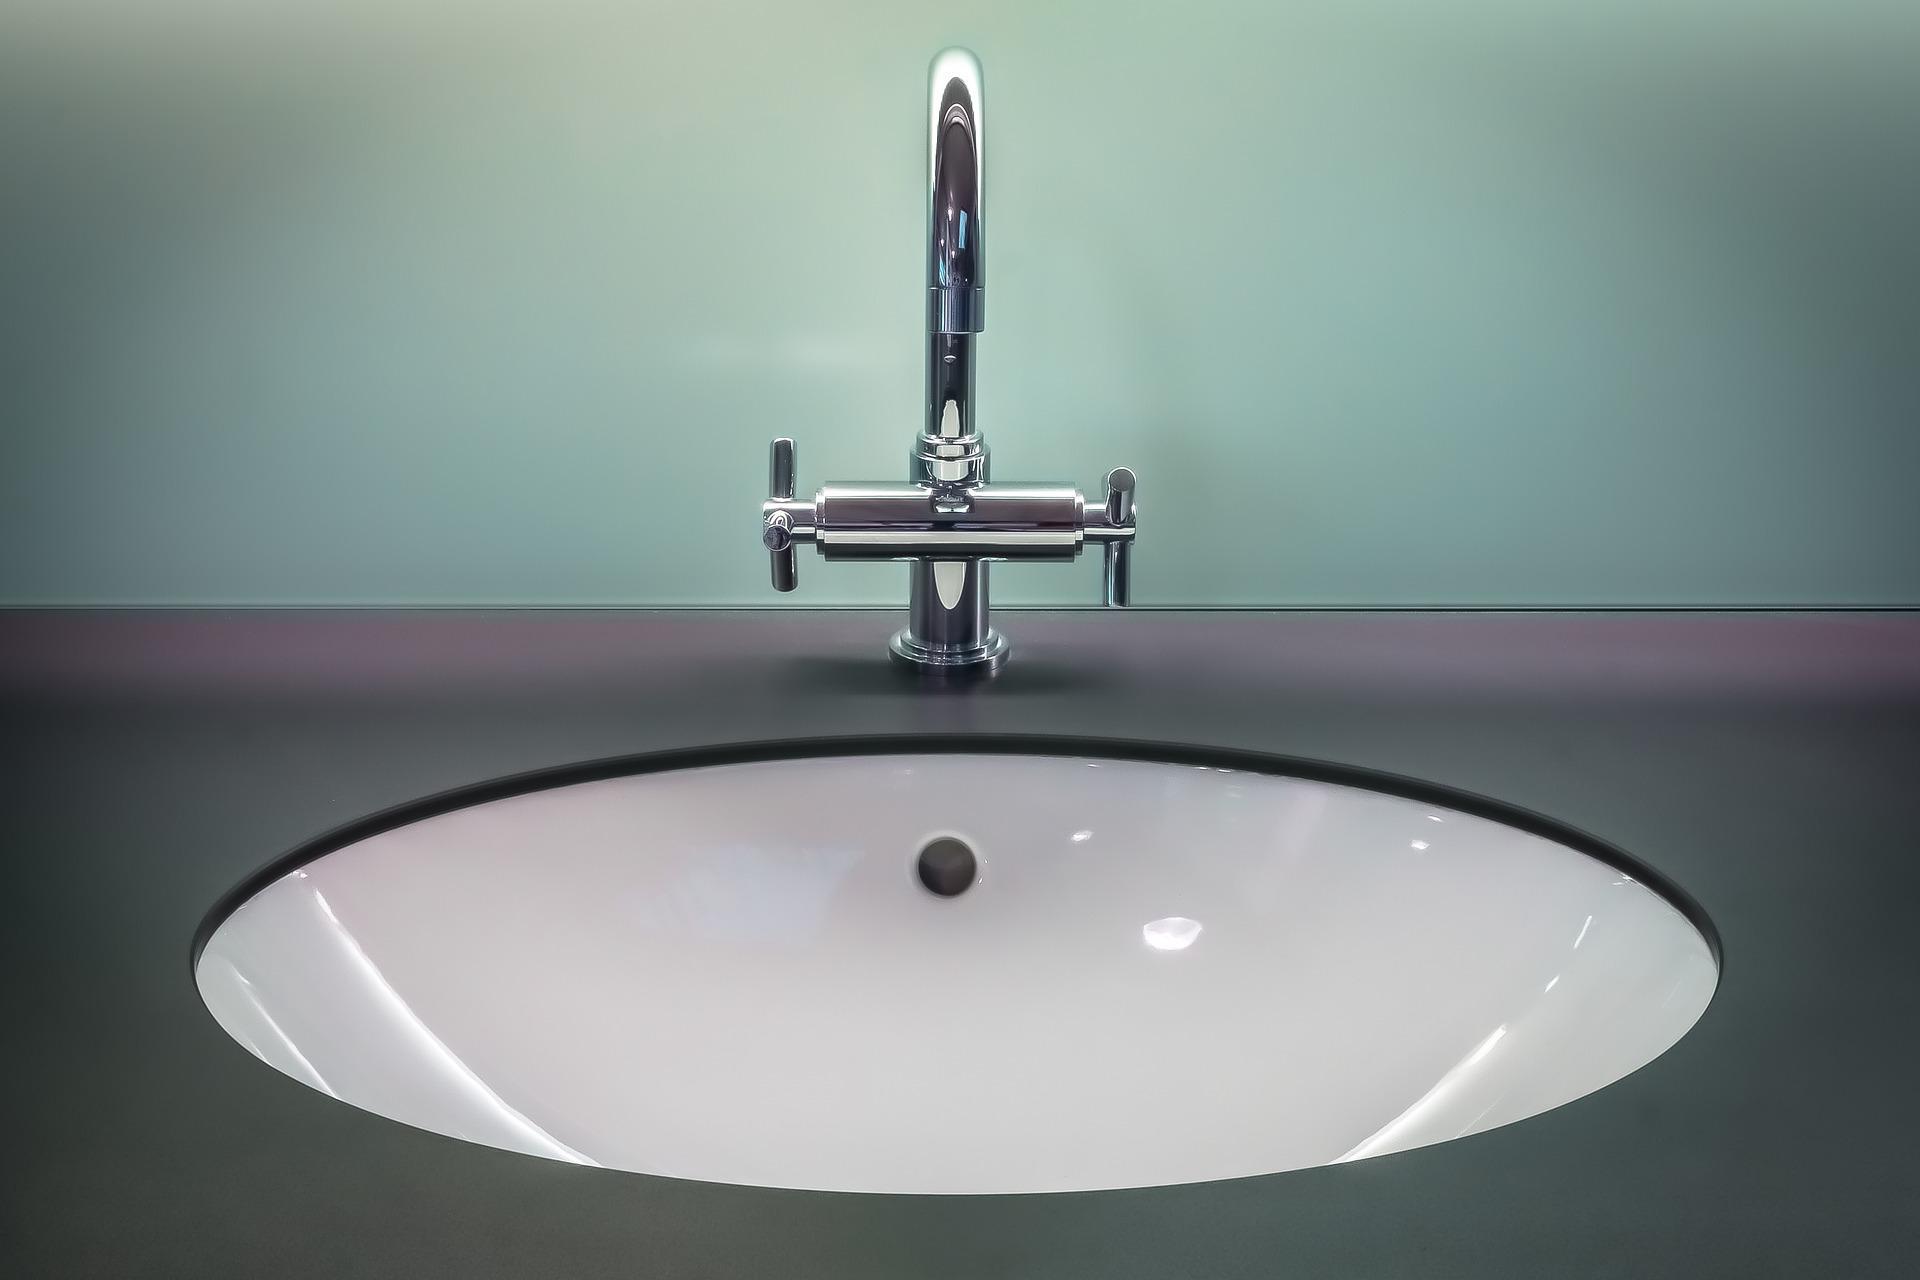 Zo maak jij de badkamer spic en span